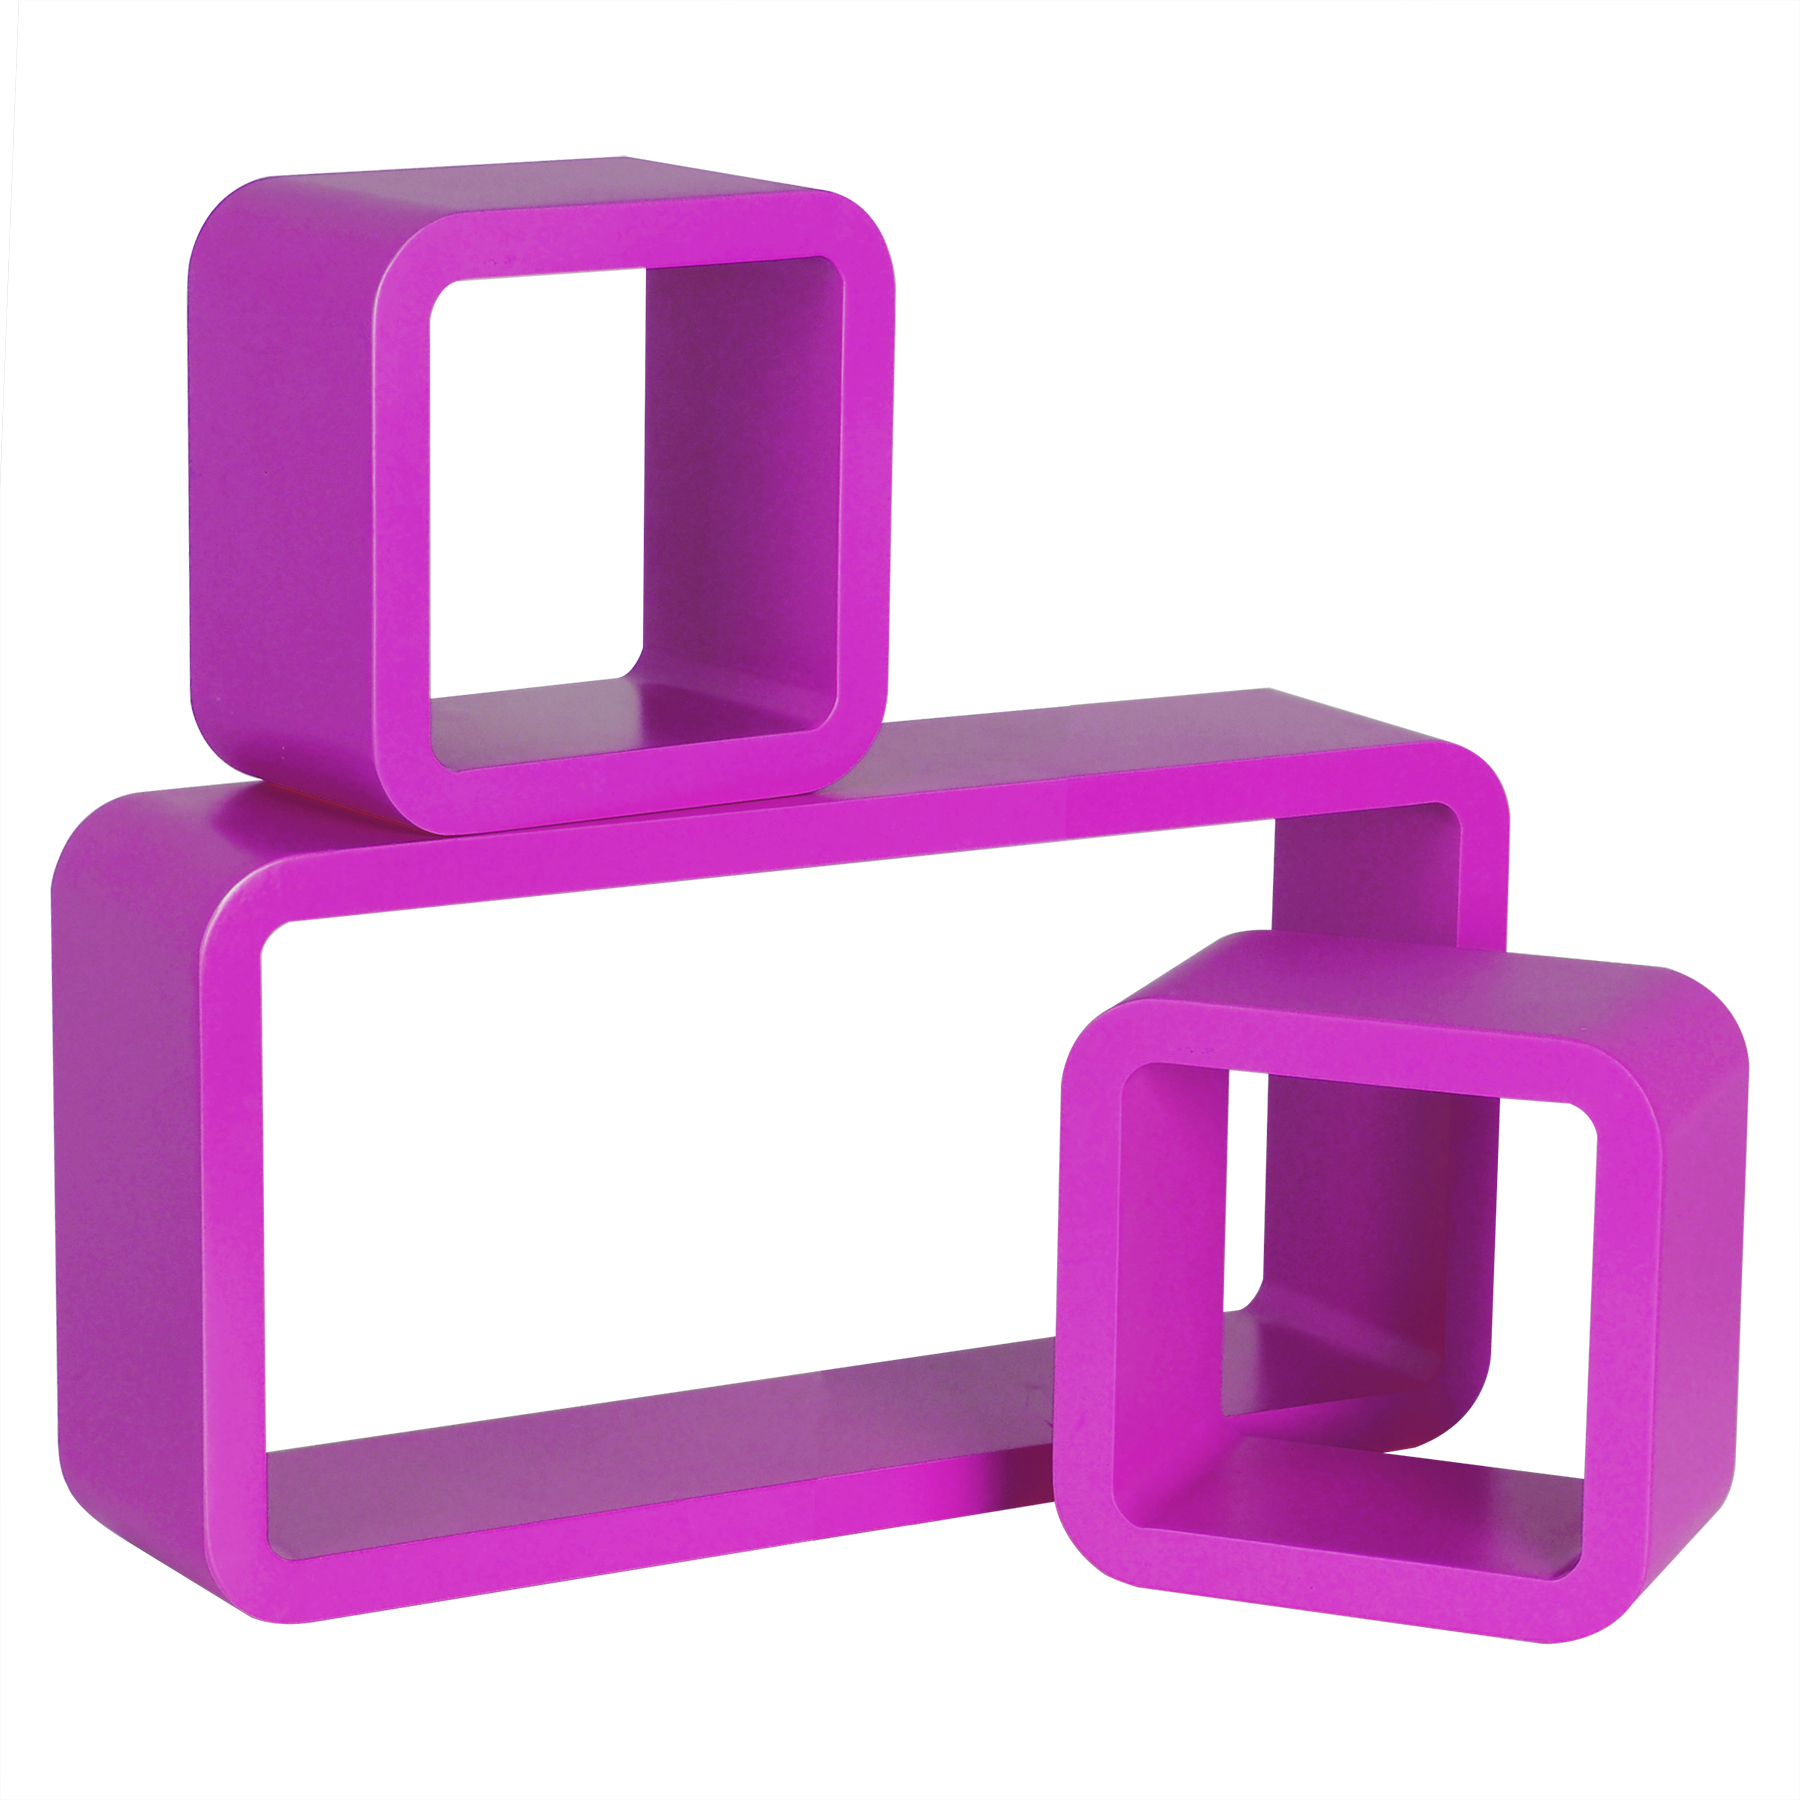 wandregal 3er set regal b cheregal h ngeregal cube retro. Black Bedroom Furniture Sets. Home Design Ideas